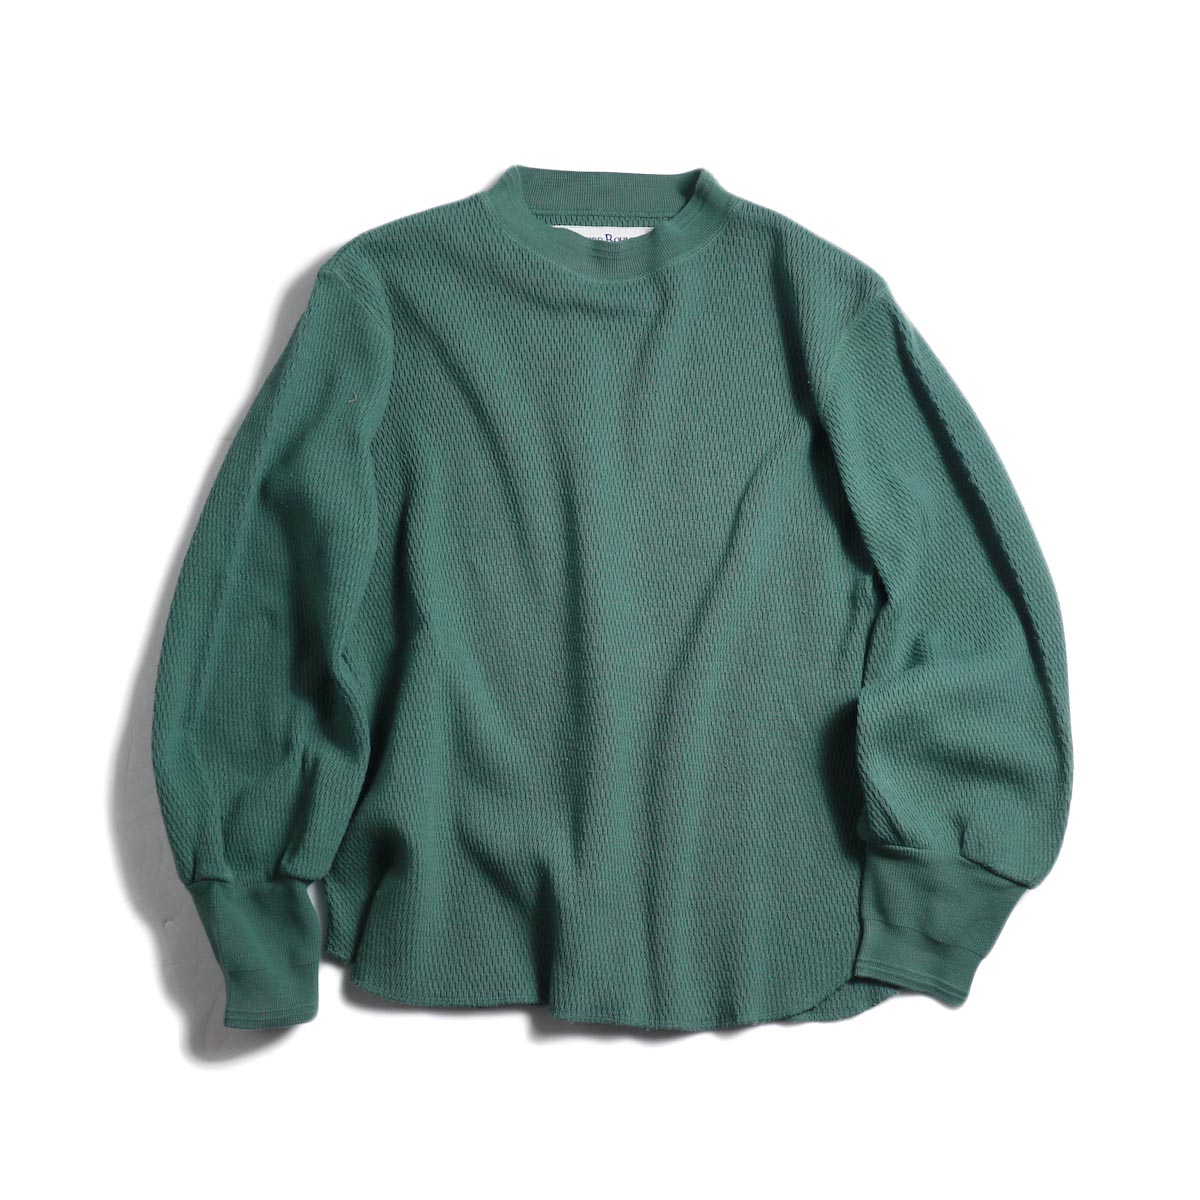 BLUEBIRD BOULEVARD / ハニカムワッフルトップ(オーバーダイ) -Green